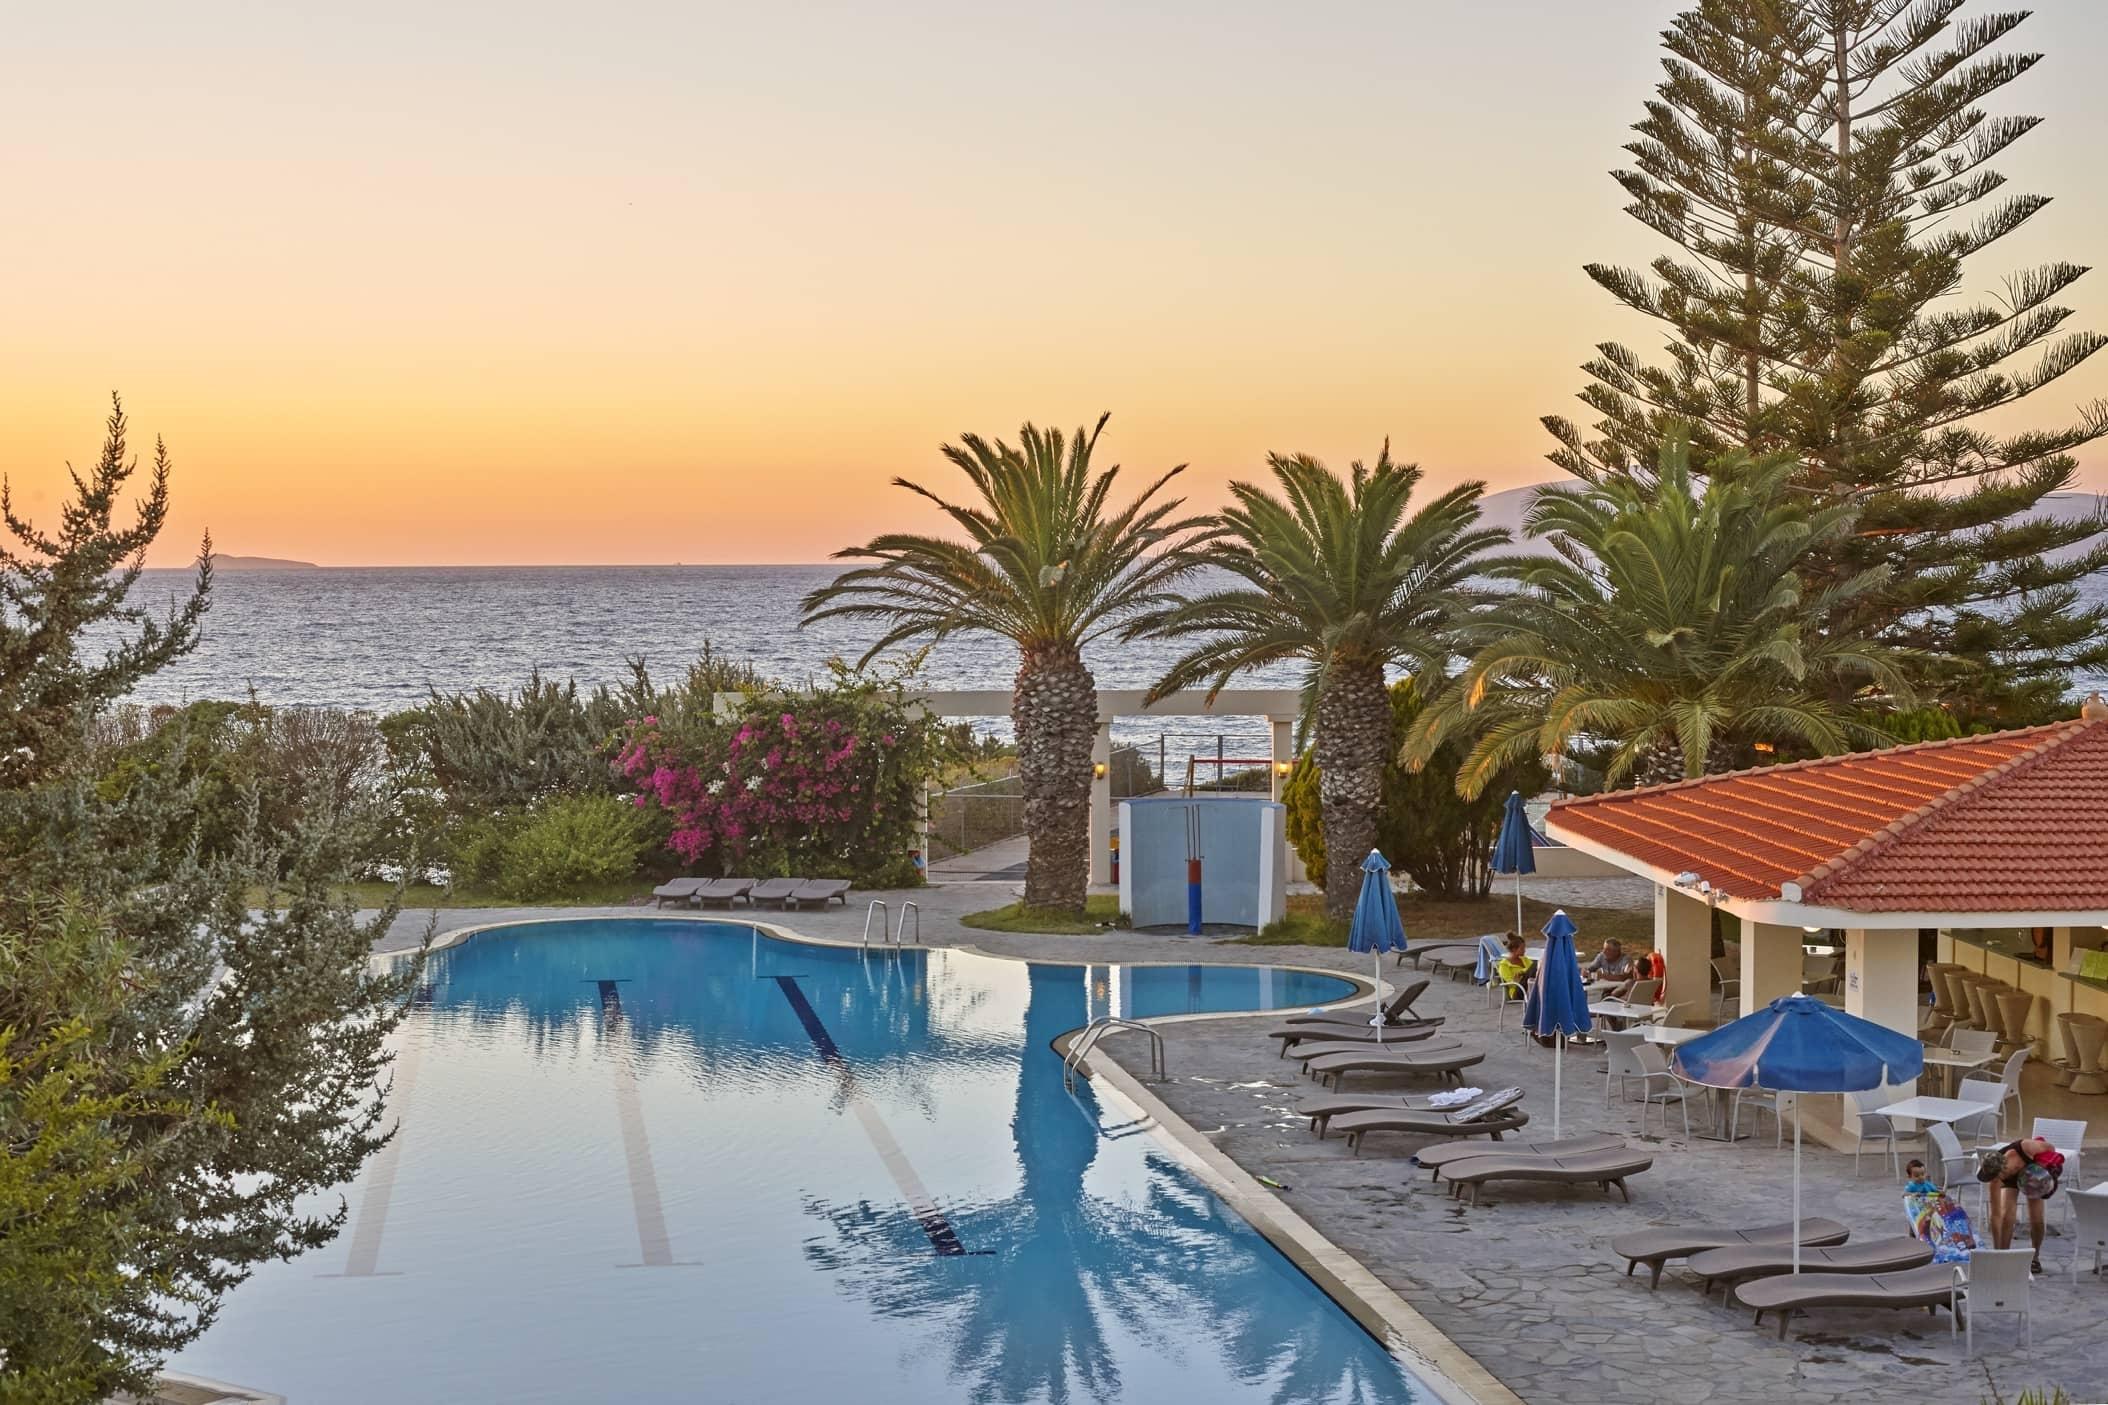 4* Ammos Resort - Μαστιχάρι, Κως ✦ 2 Ημέρες (1 Διανυκτέρευση)